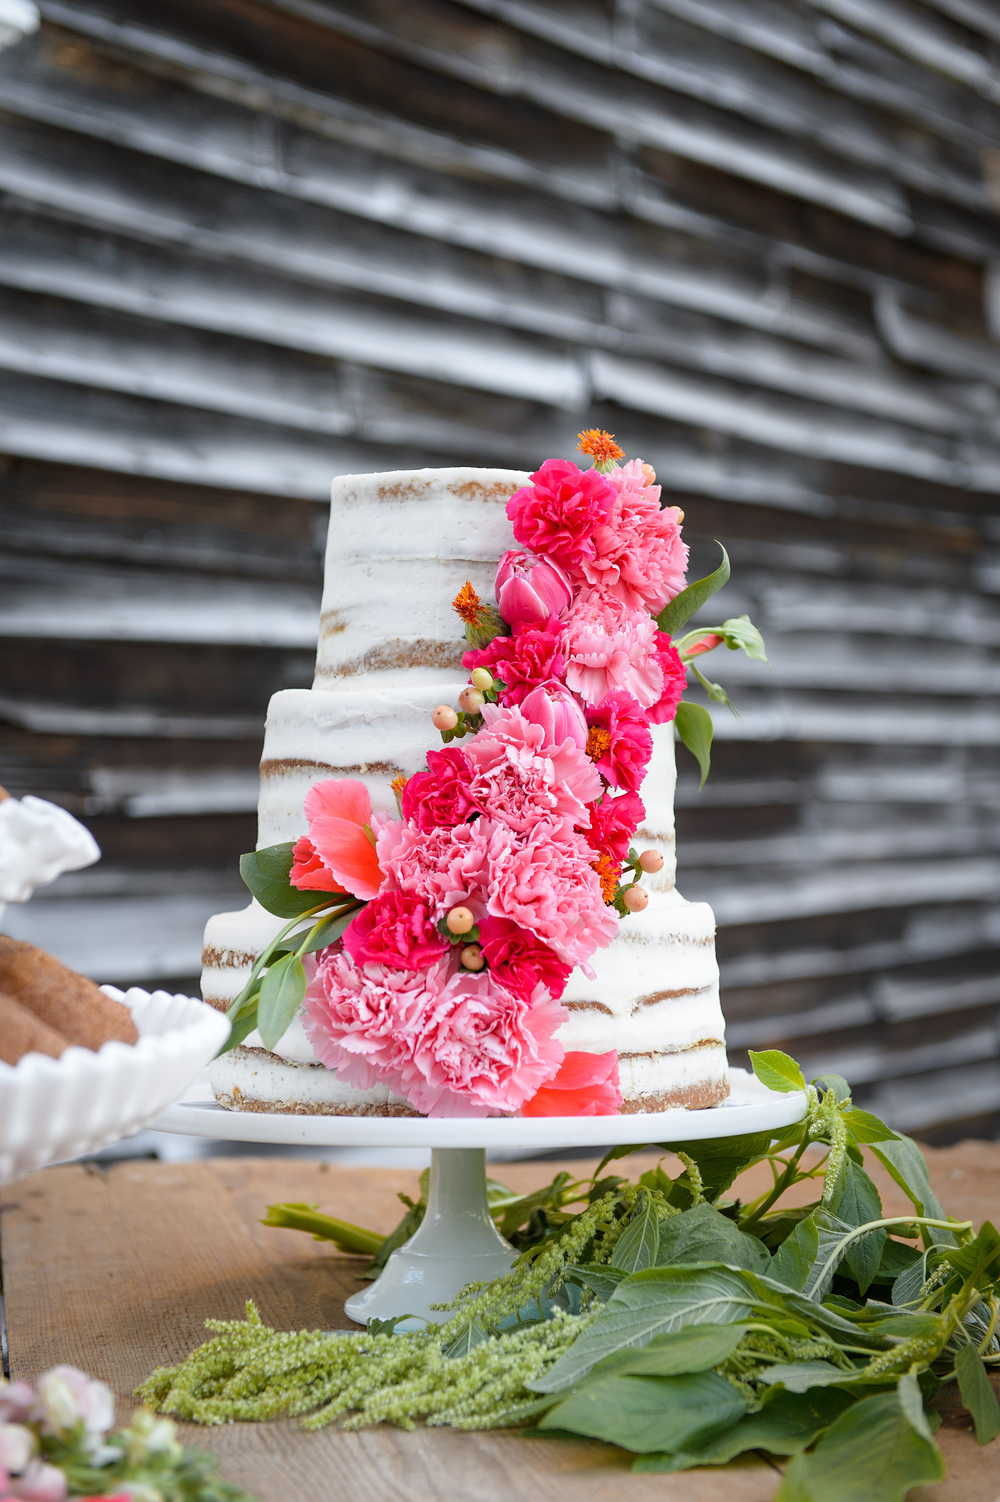 Wedding Cakes — Nothing Bakes Like a Parrott